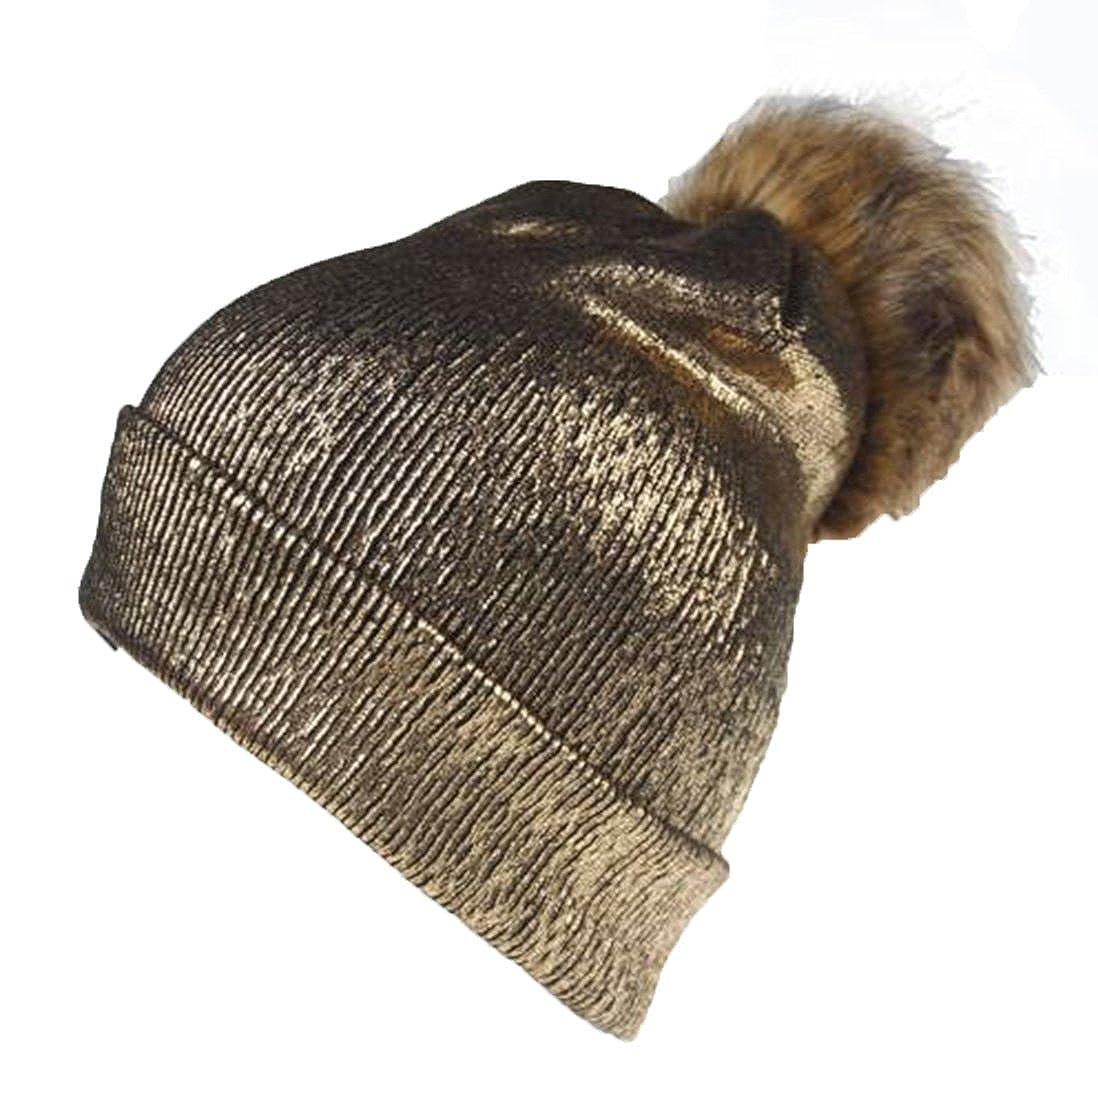 Limado Women Fur Pom Pom Ball Knit Crochet Baggy Bobble Hat Beanie Beret  Ski Cap Winter (Gold) at Amazon Women s Clothing store  4ff2162d0afb